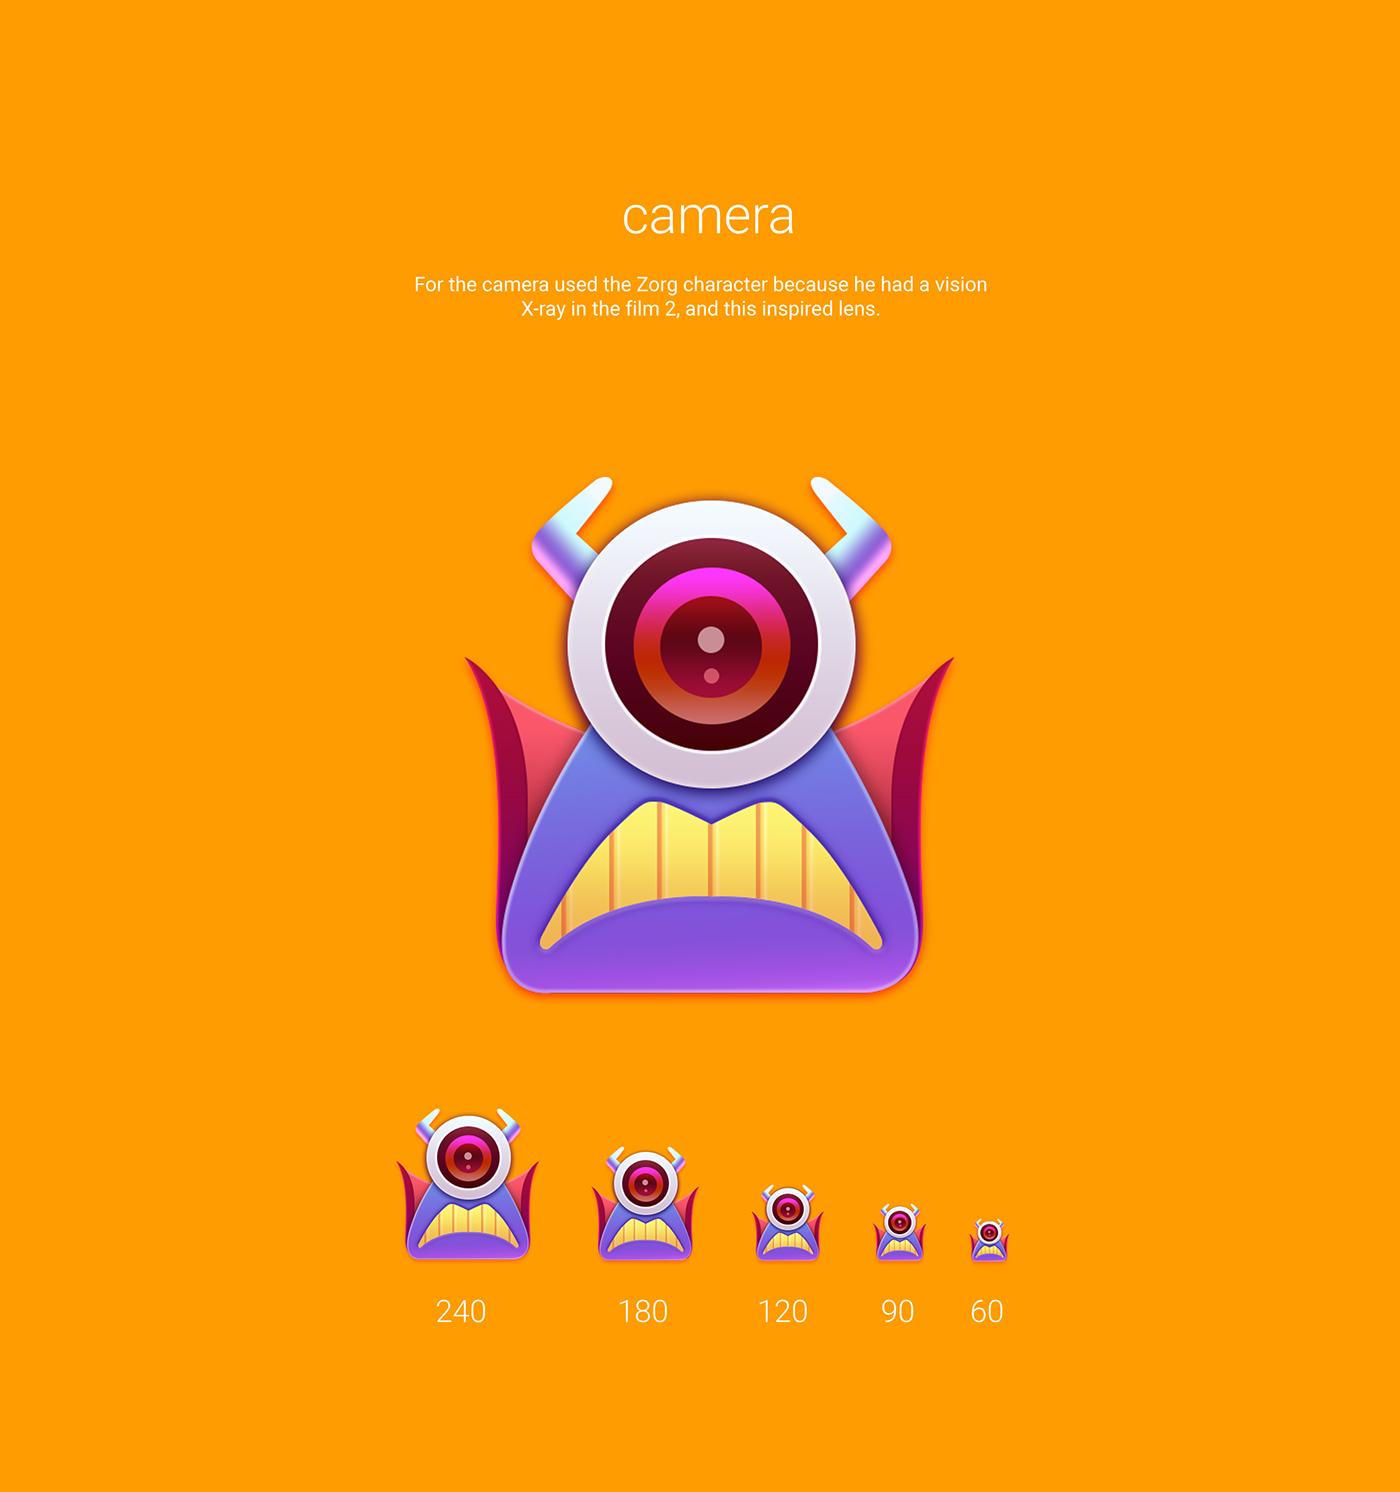 disney-pixar-toy-story-android-icons-leo-natsume-16